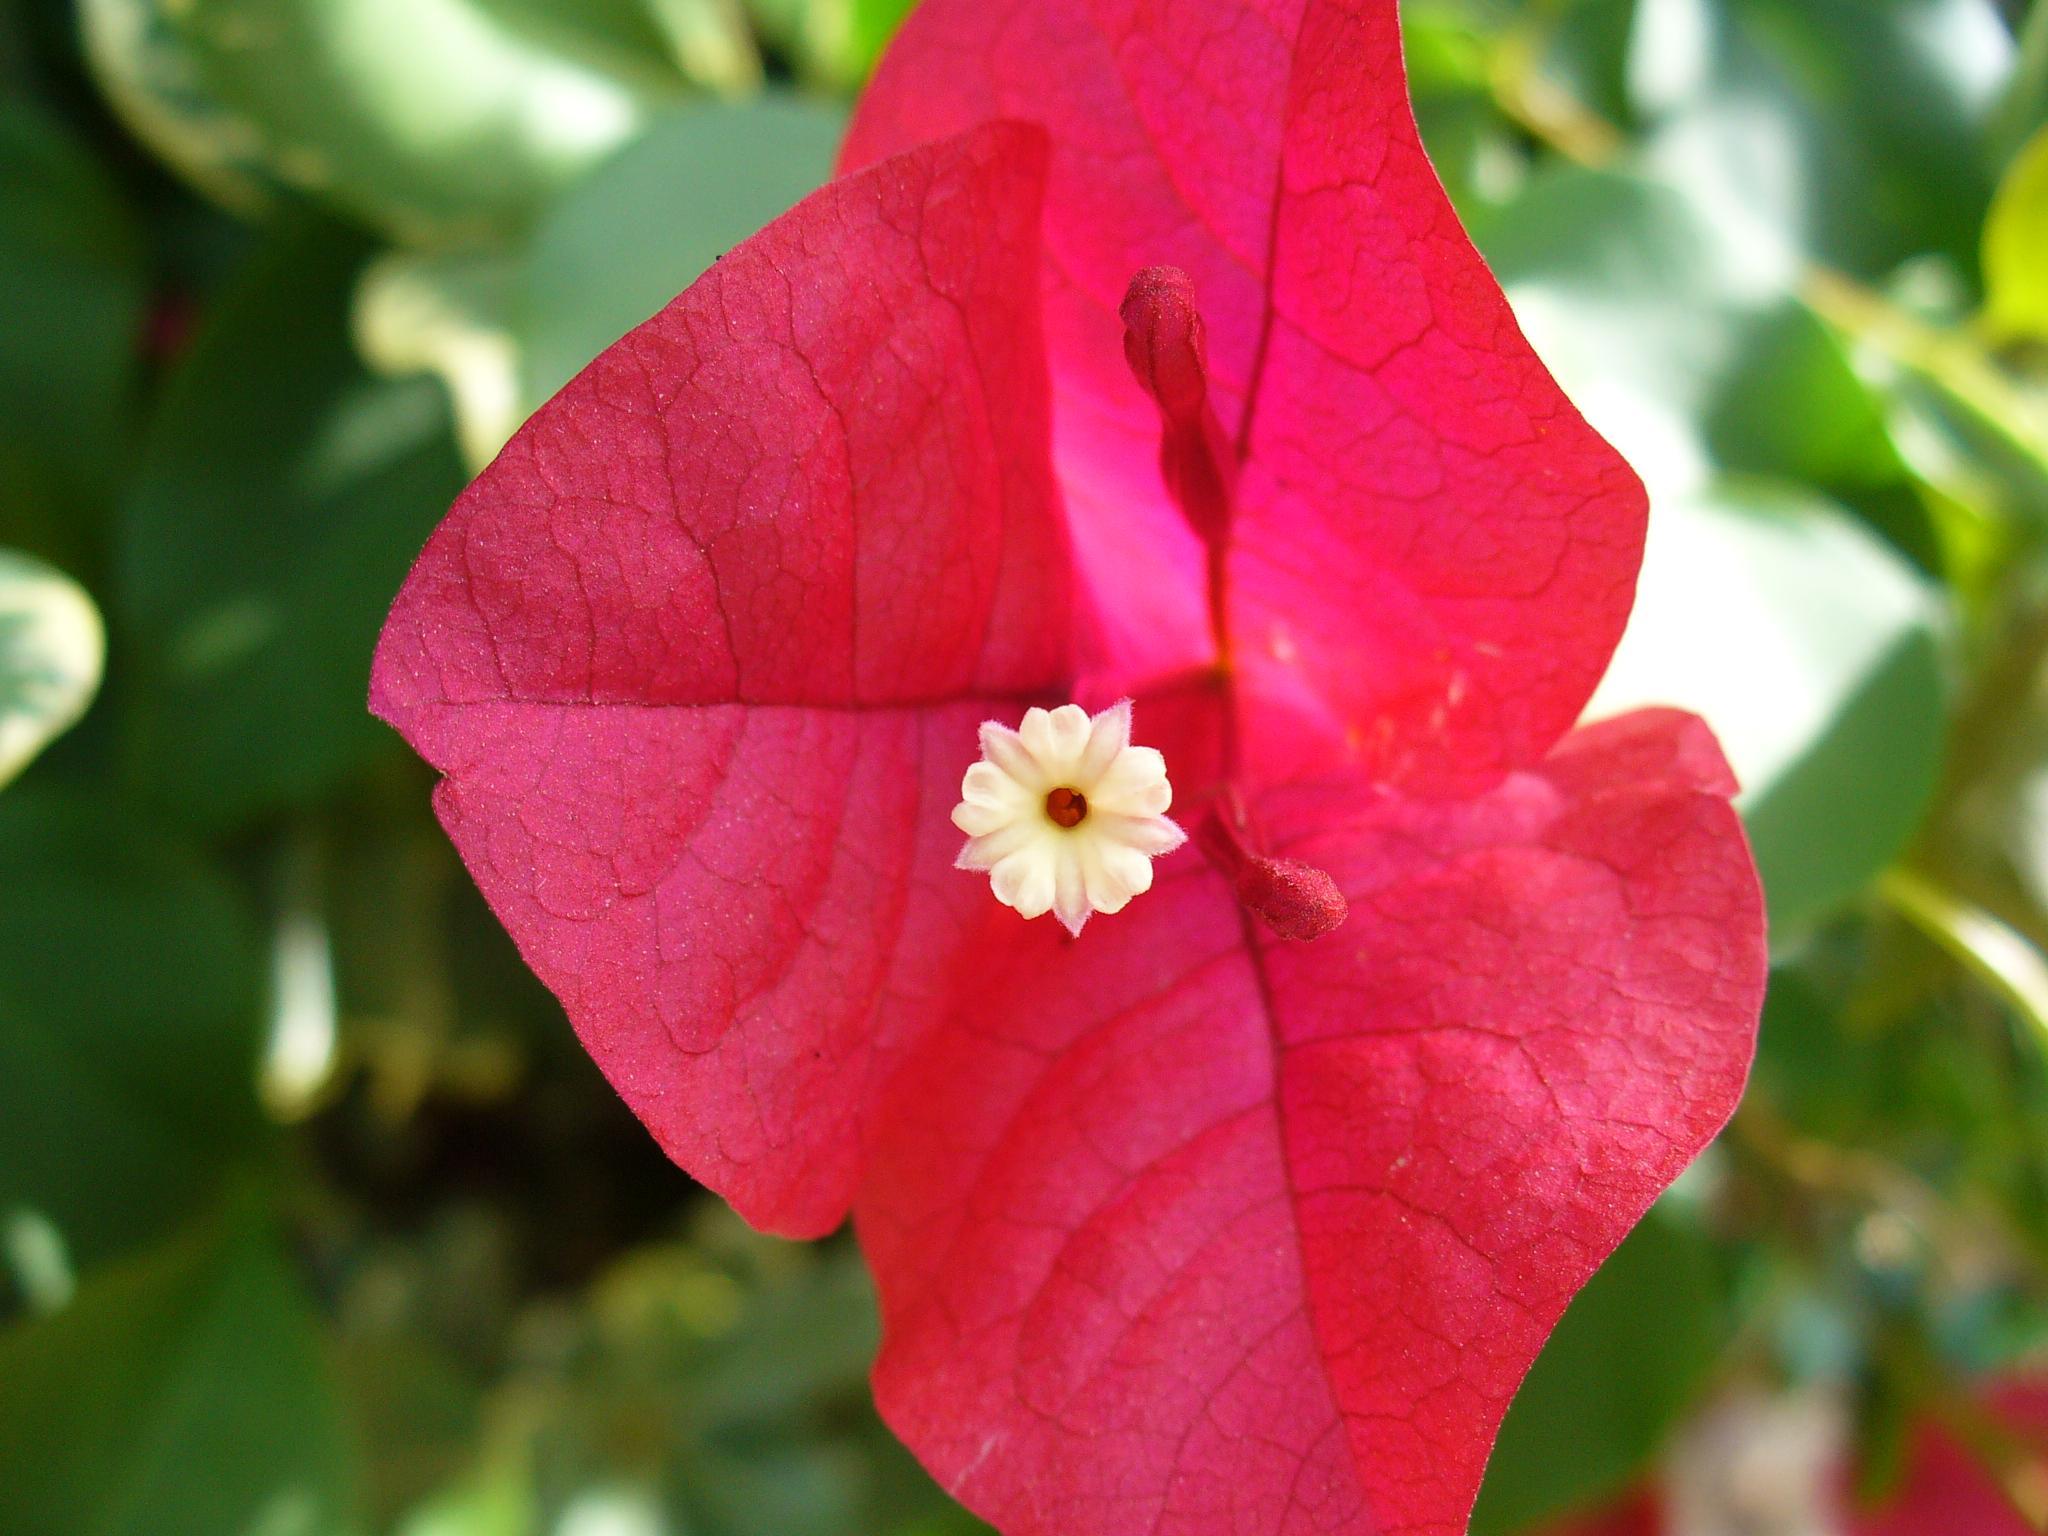 Flower in a flower by Jonathan Binisti